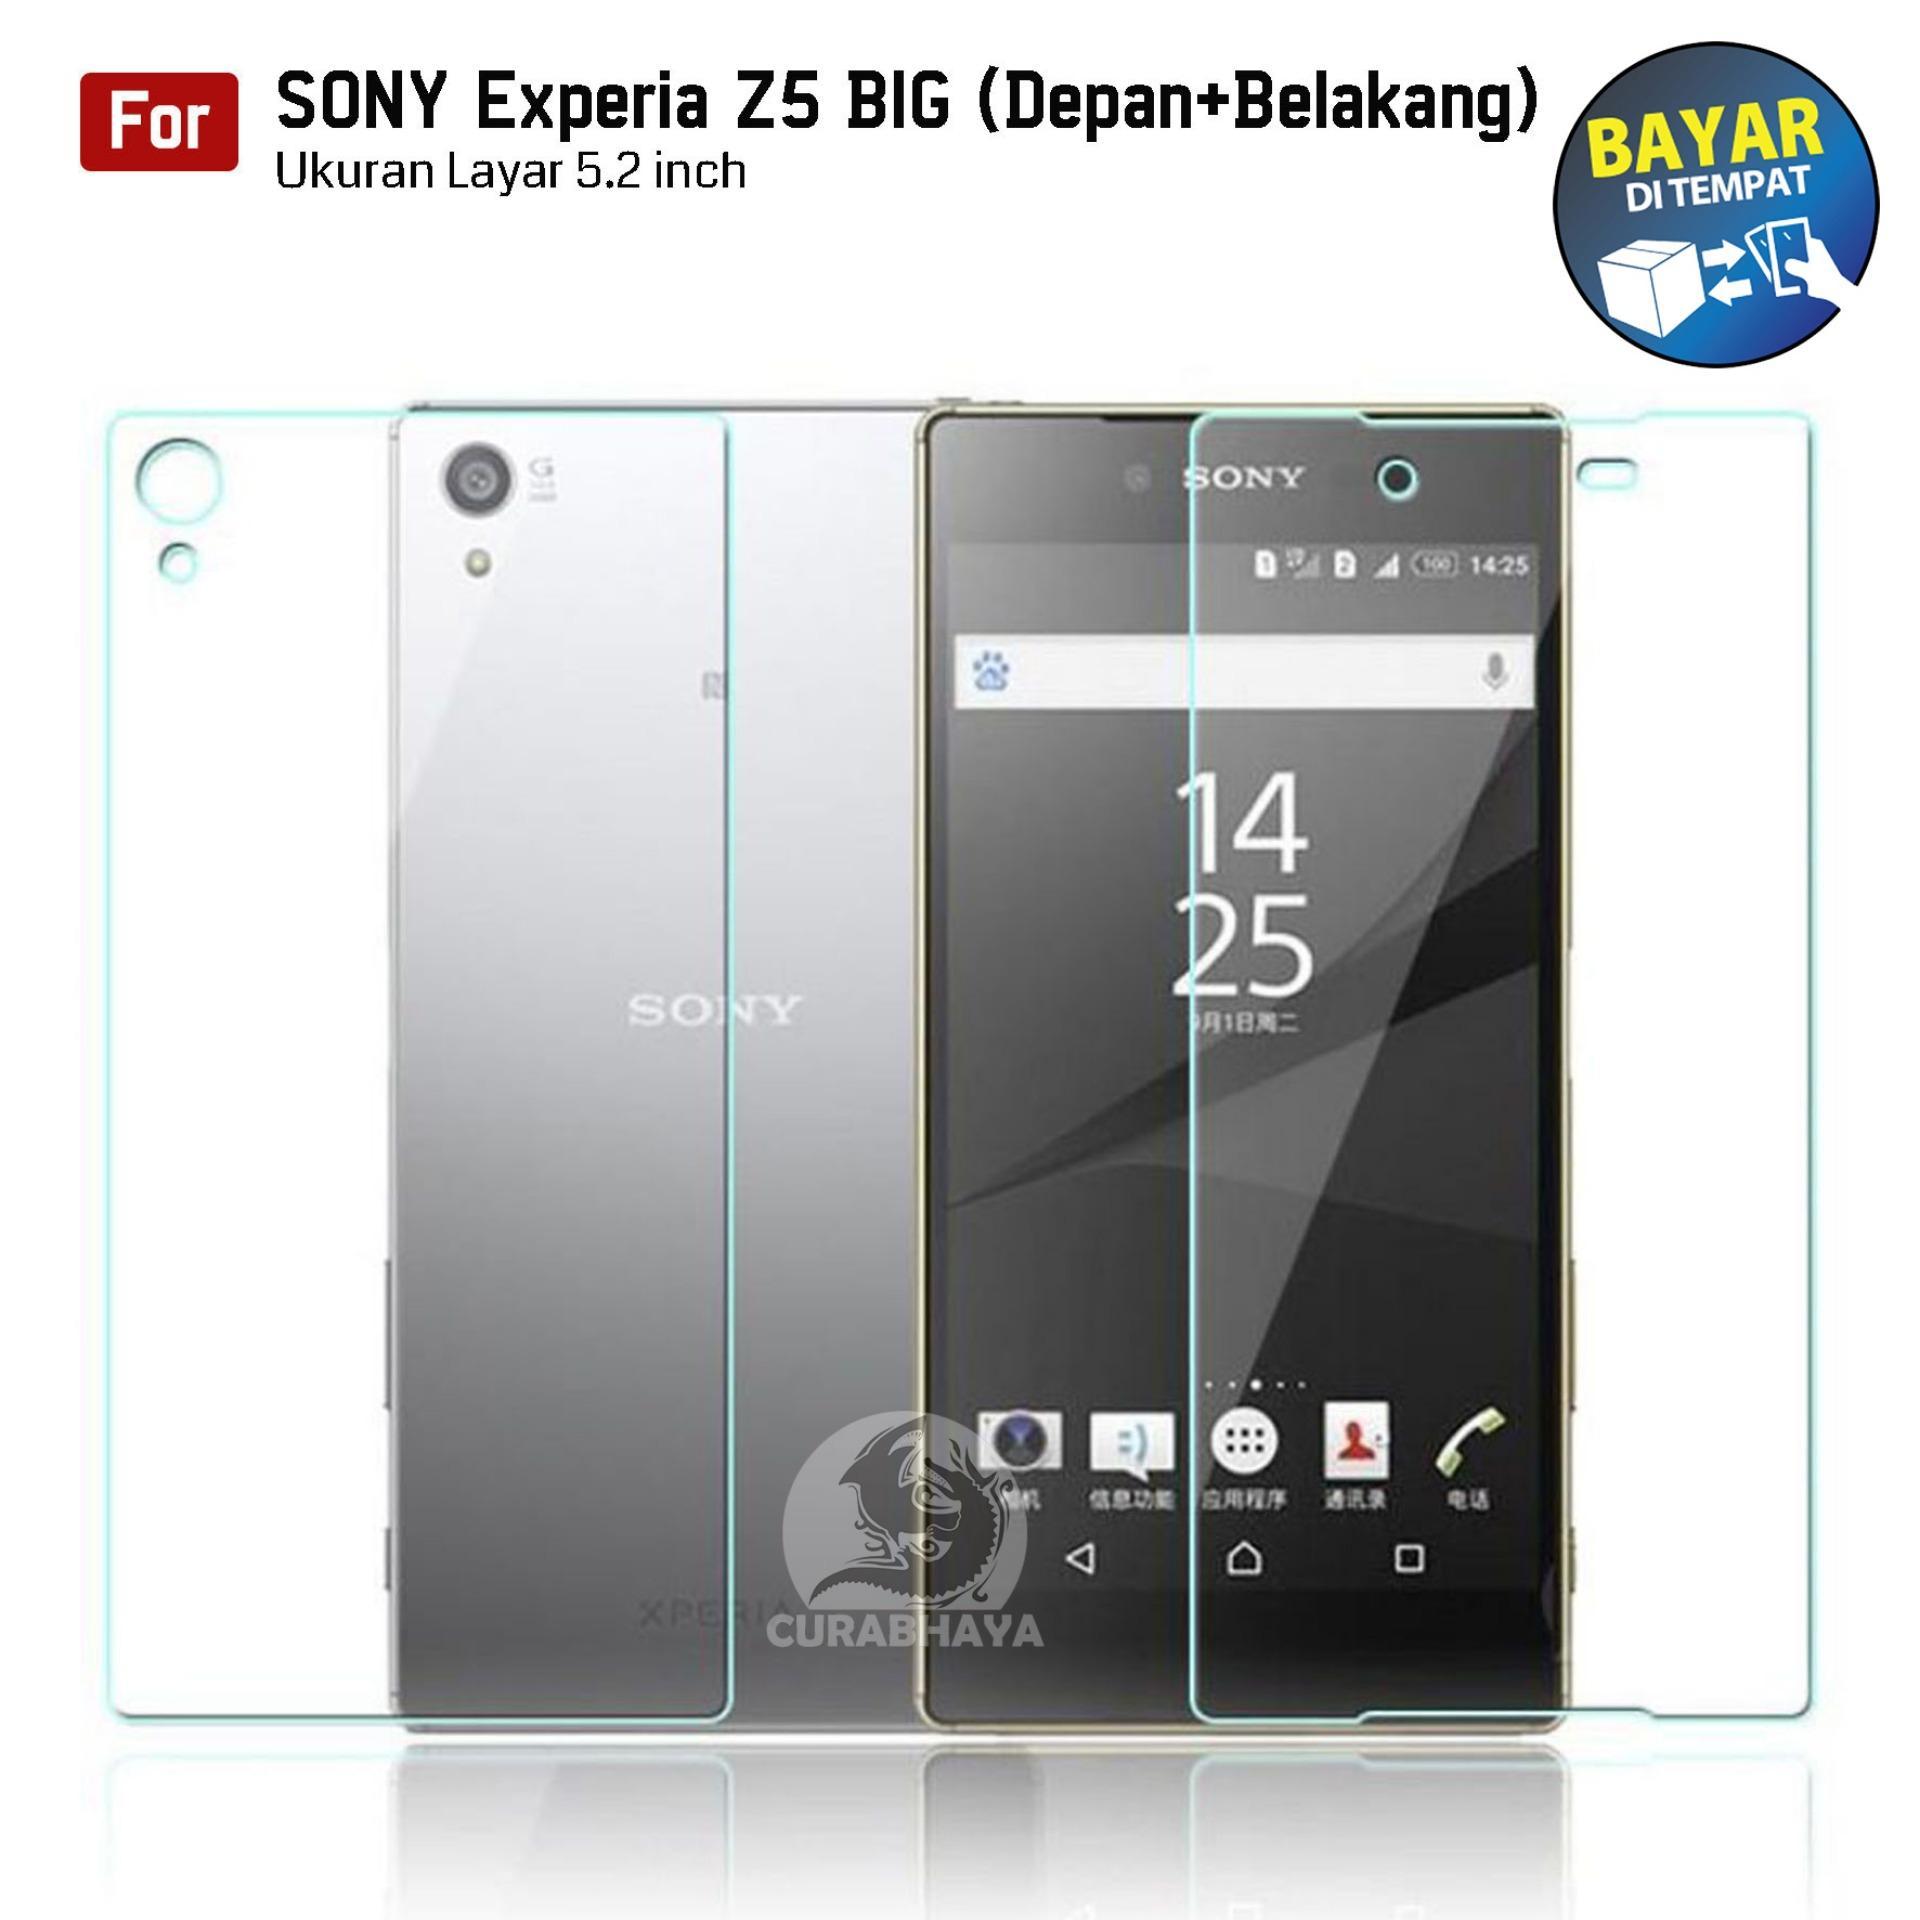 Kong Tempered Glass Sony Xperia Experia Z5 BIG (Depan+Belakang) / Docomo / Dual / E6653 / E6683 / E6603 | (Front+Back) 9H Screen Protector 0.32mm - Bening